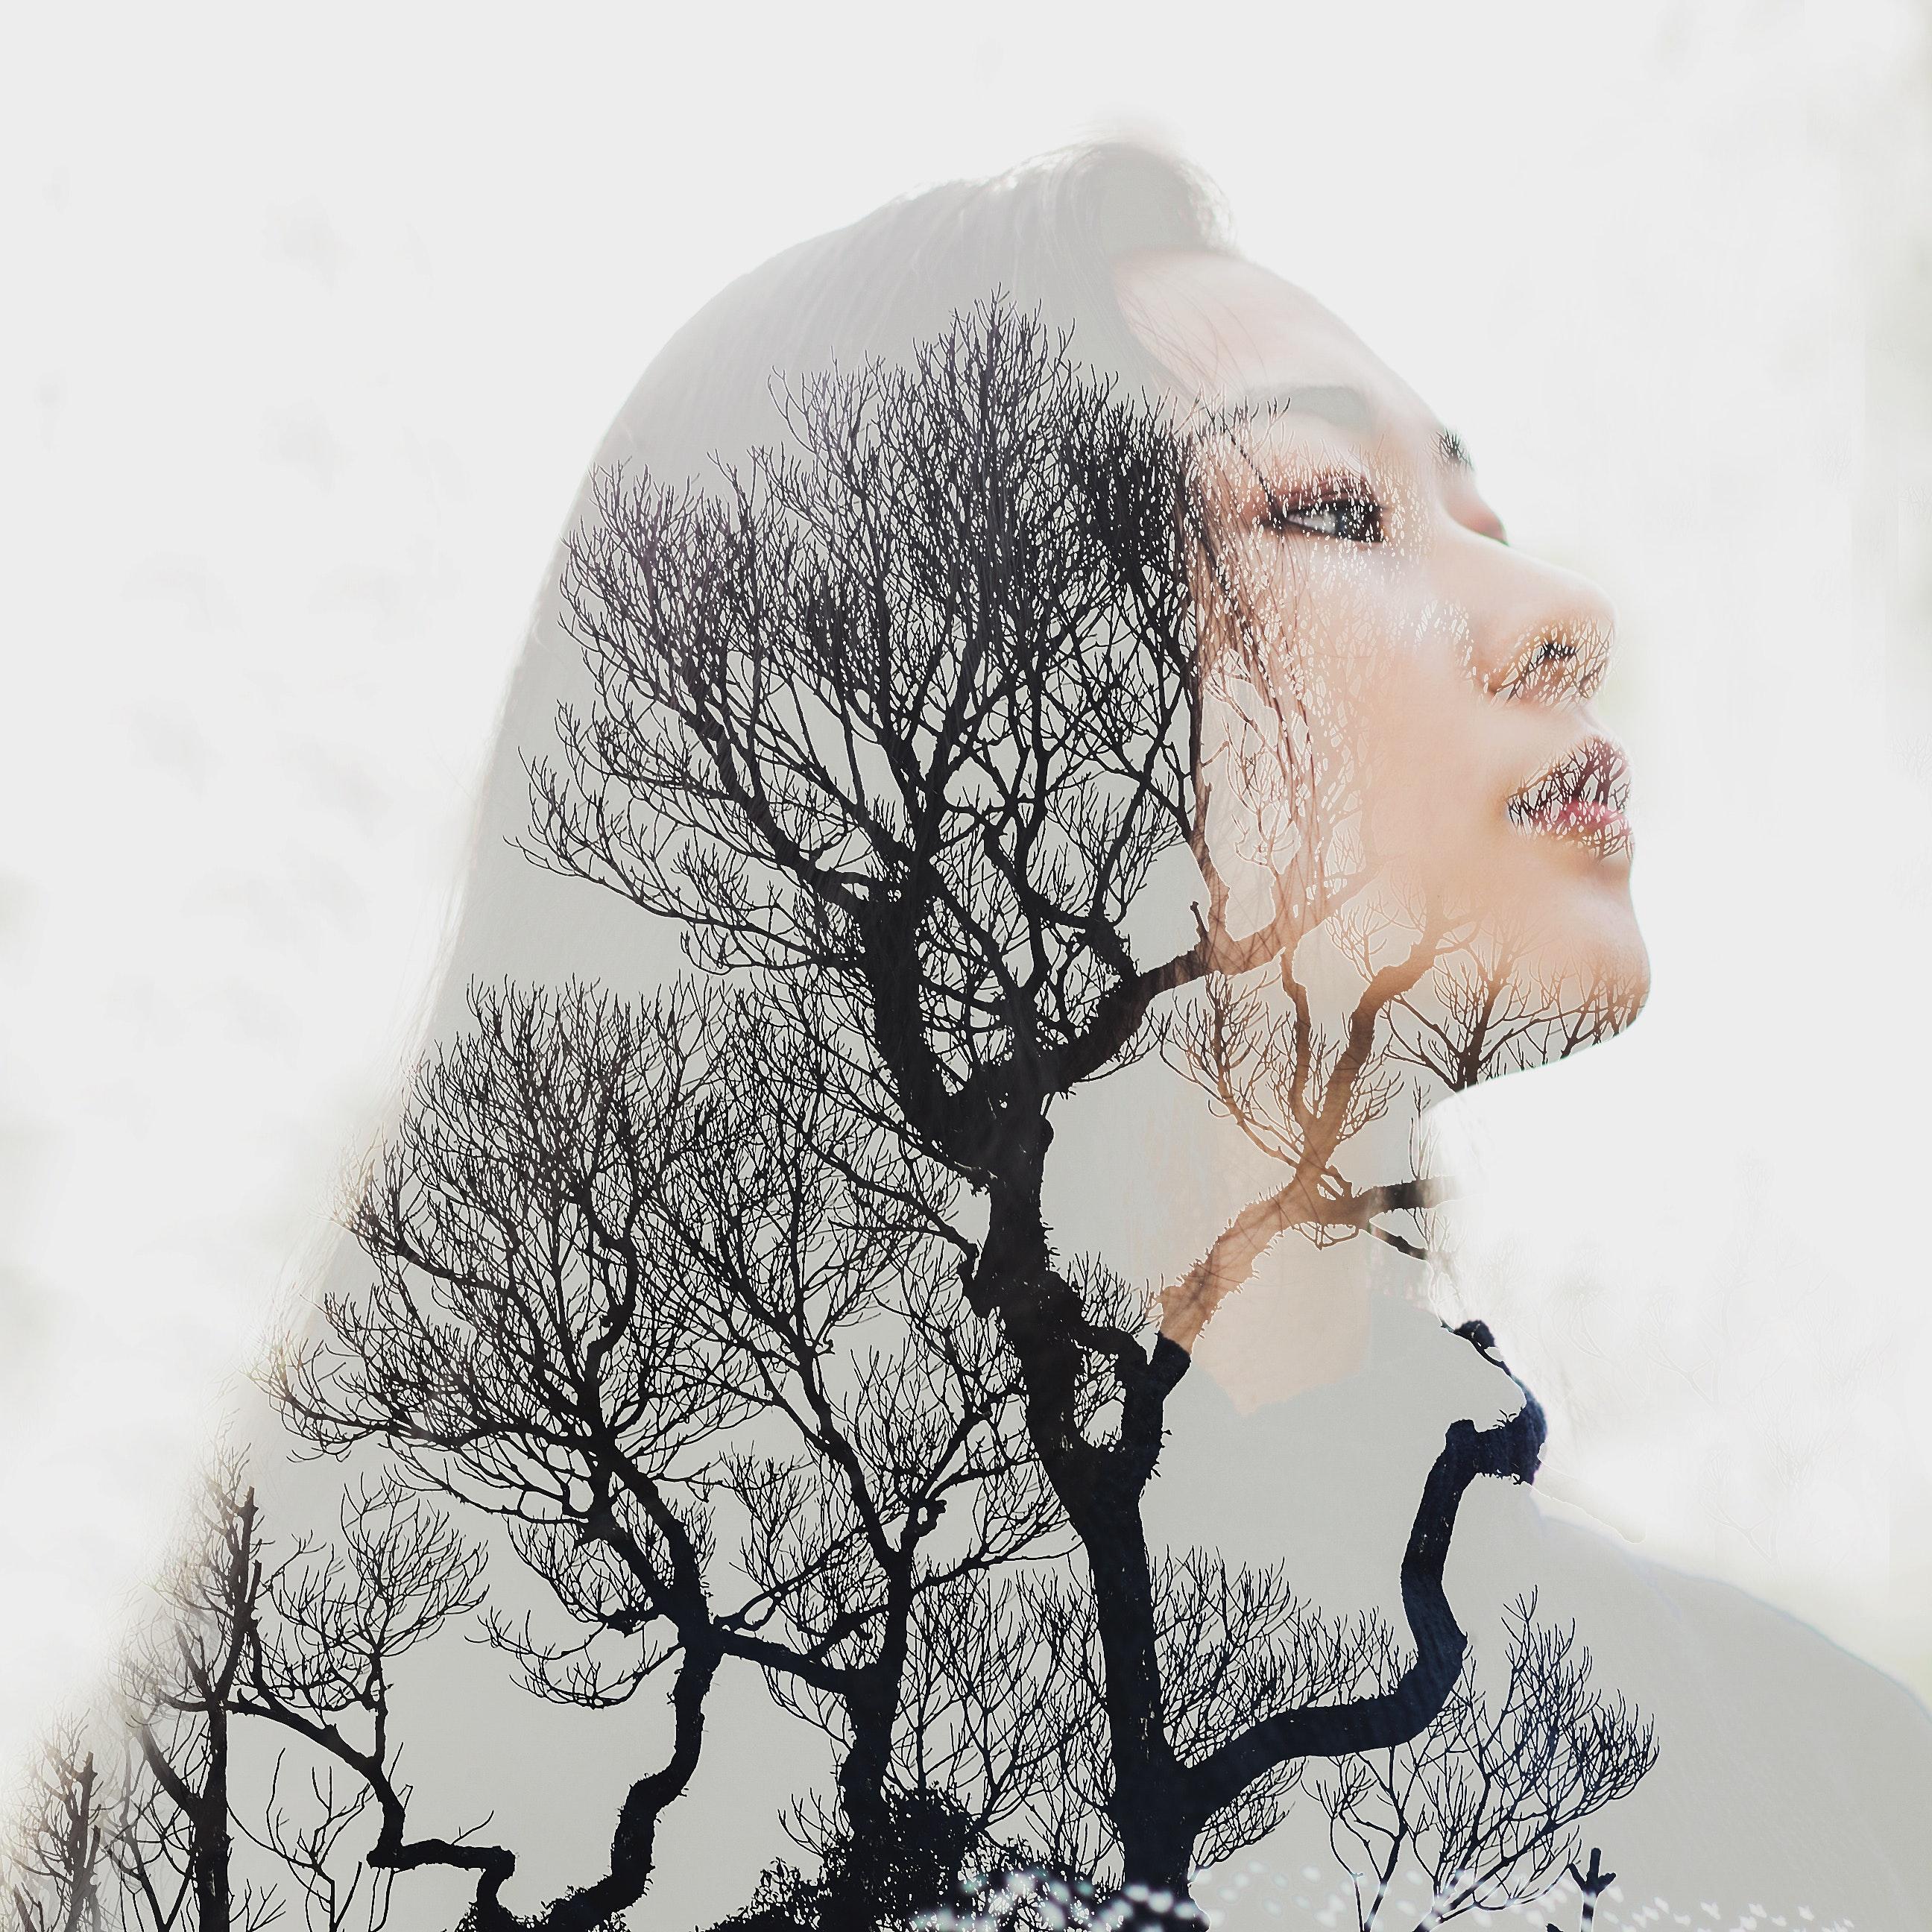 Digital Artworks by soad2K